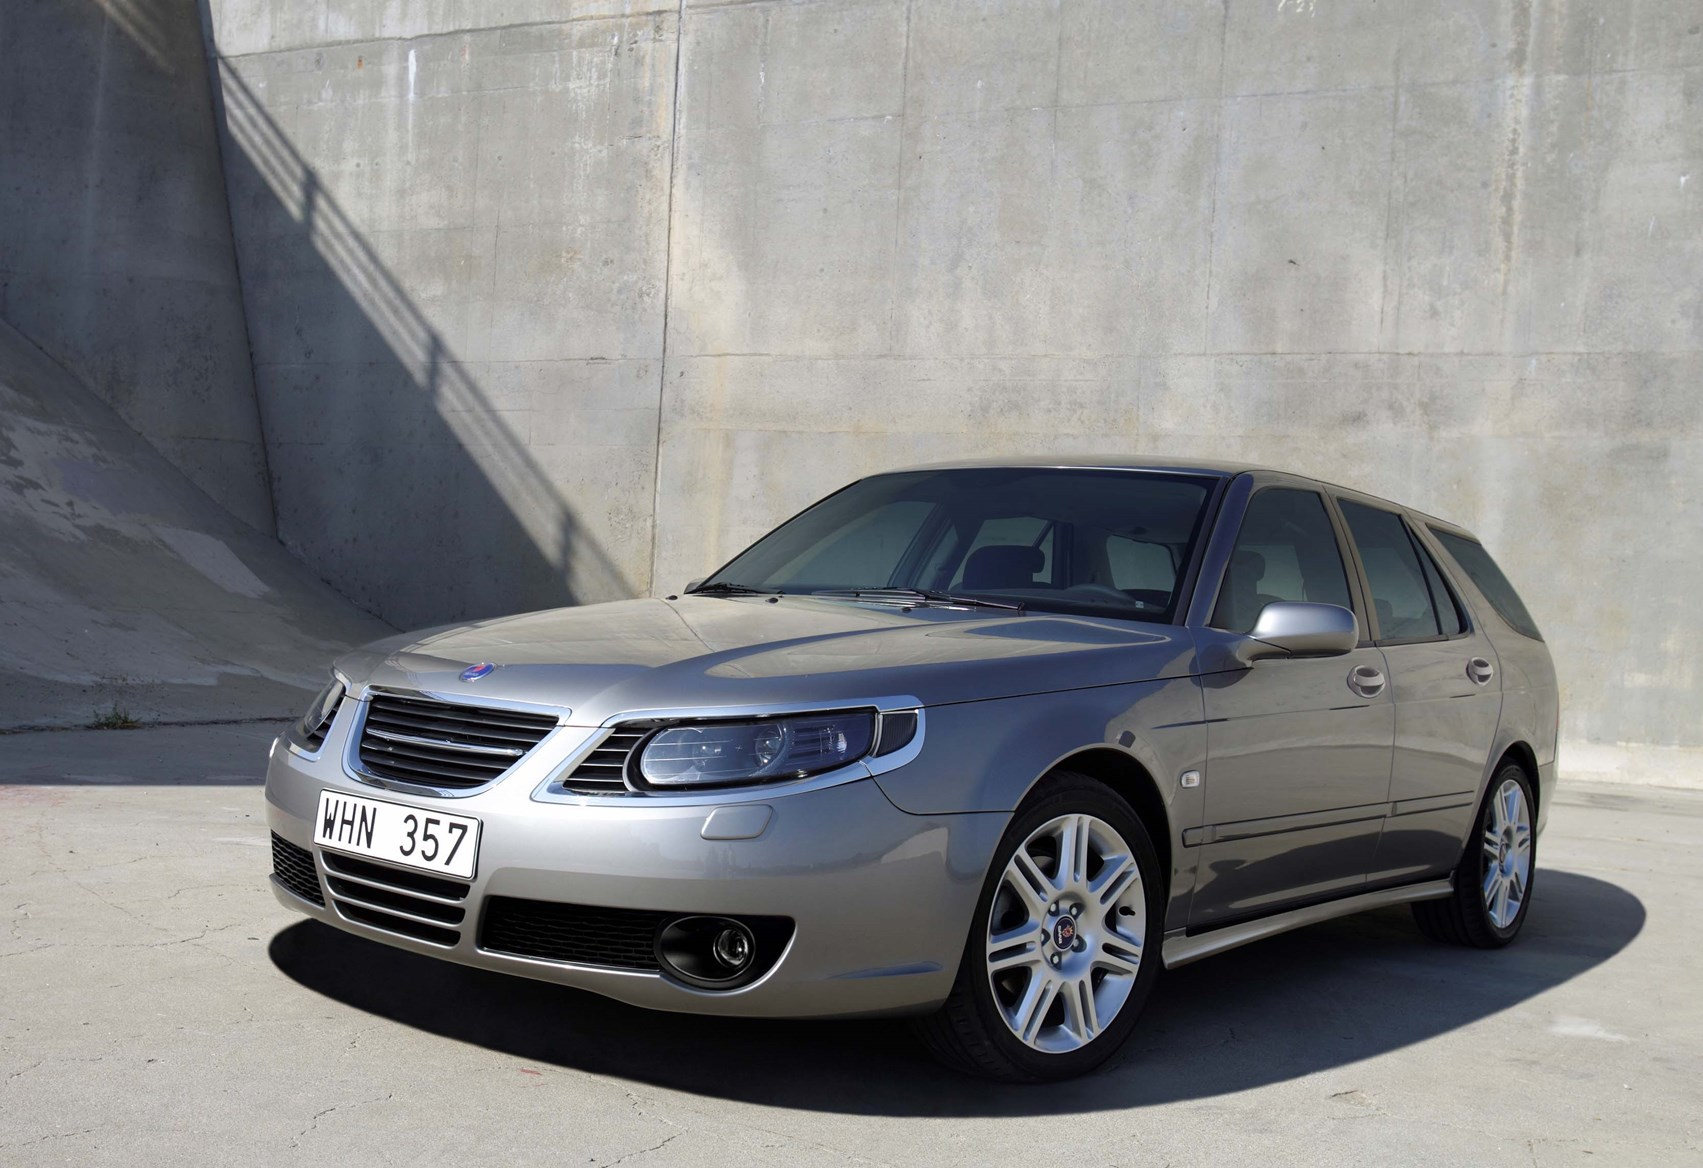 Saab 9-5 Estate Review (2005 - 2010) | Parkers